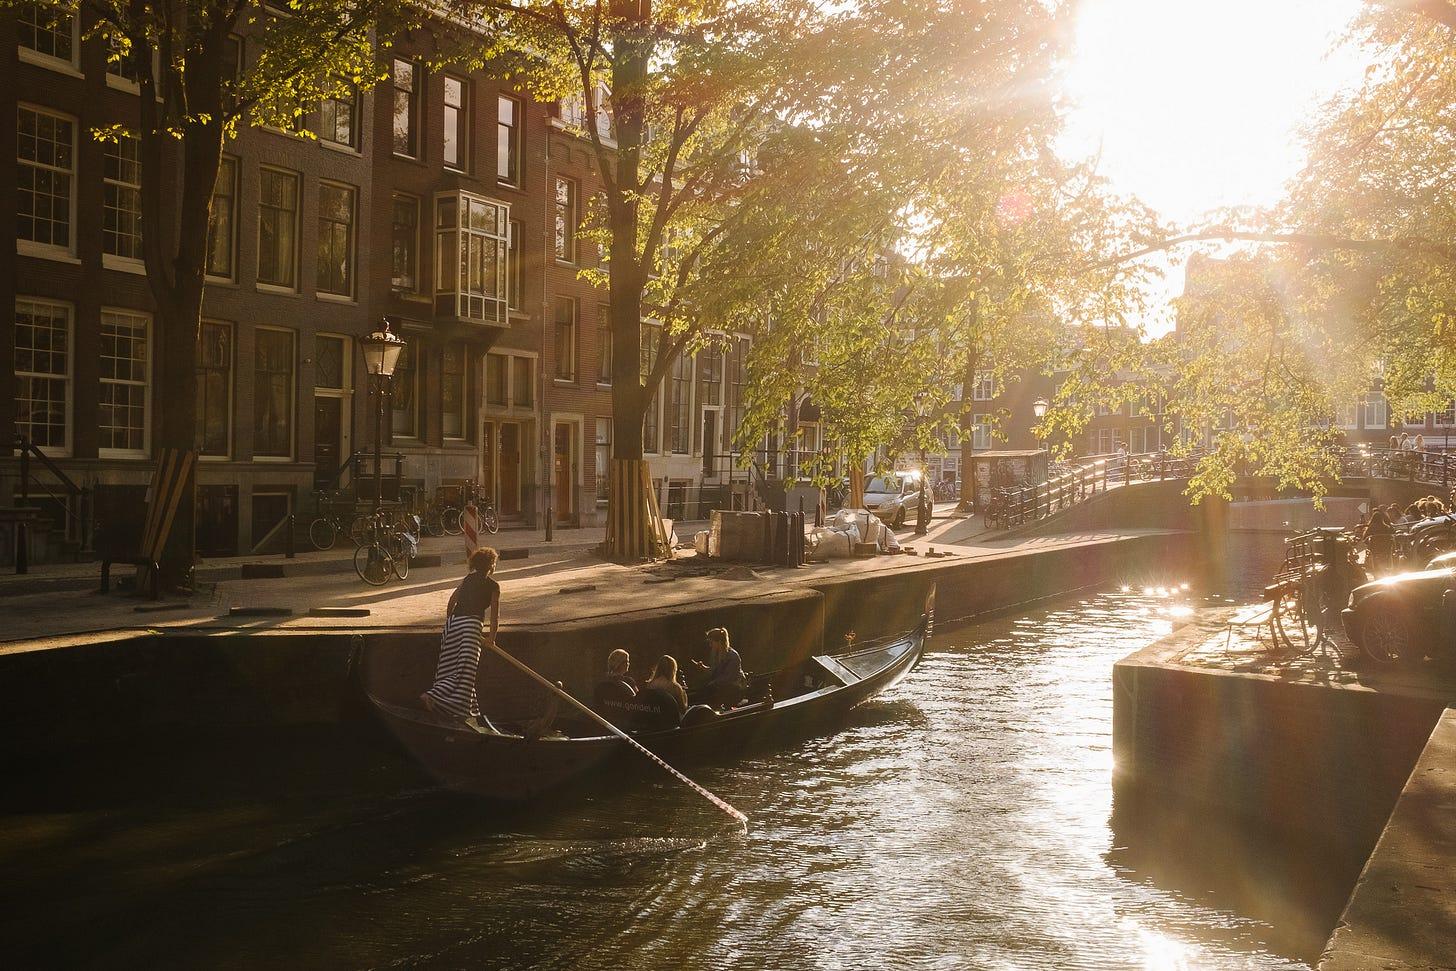 16-amsterdam-netherlands-3379-pete-carr.jpg